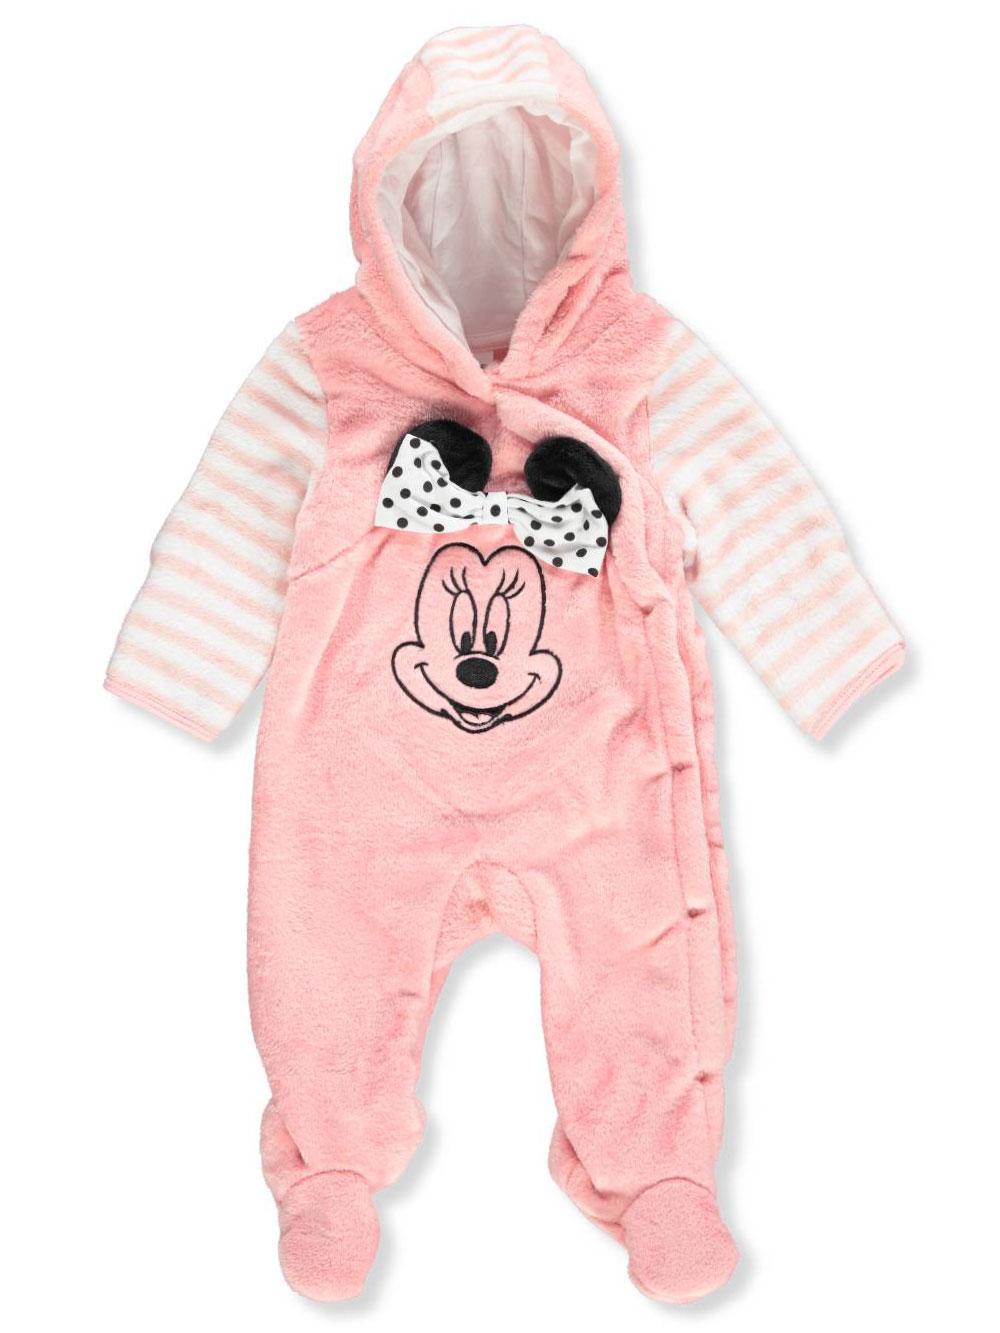 86c53430f Disney Minnie Mouse Baby Girls  Hooded Pram Suit